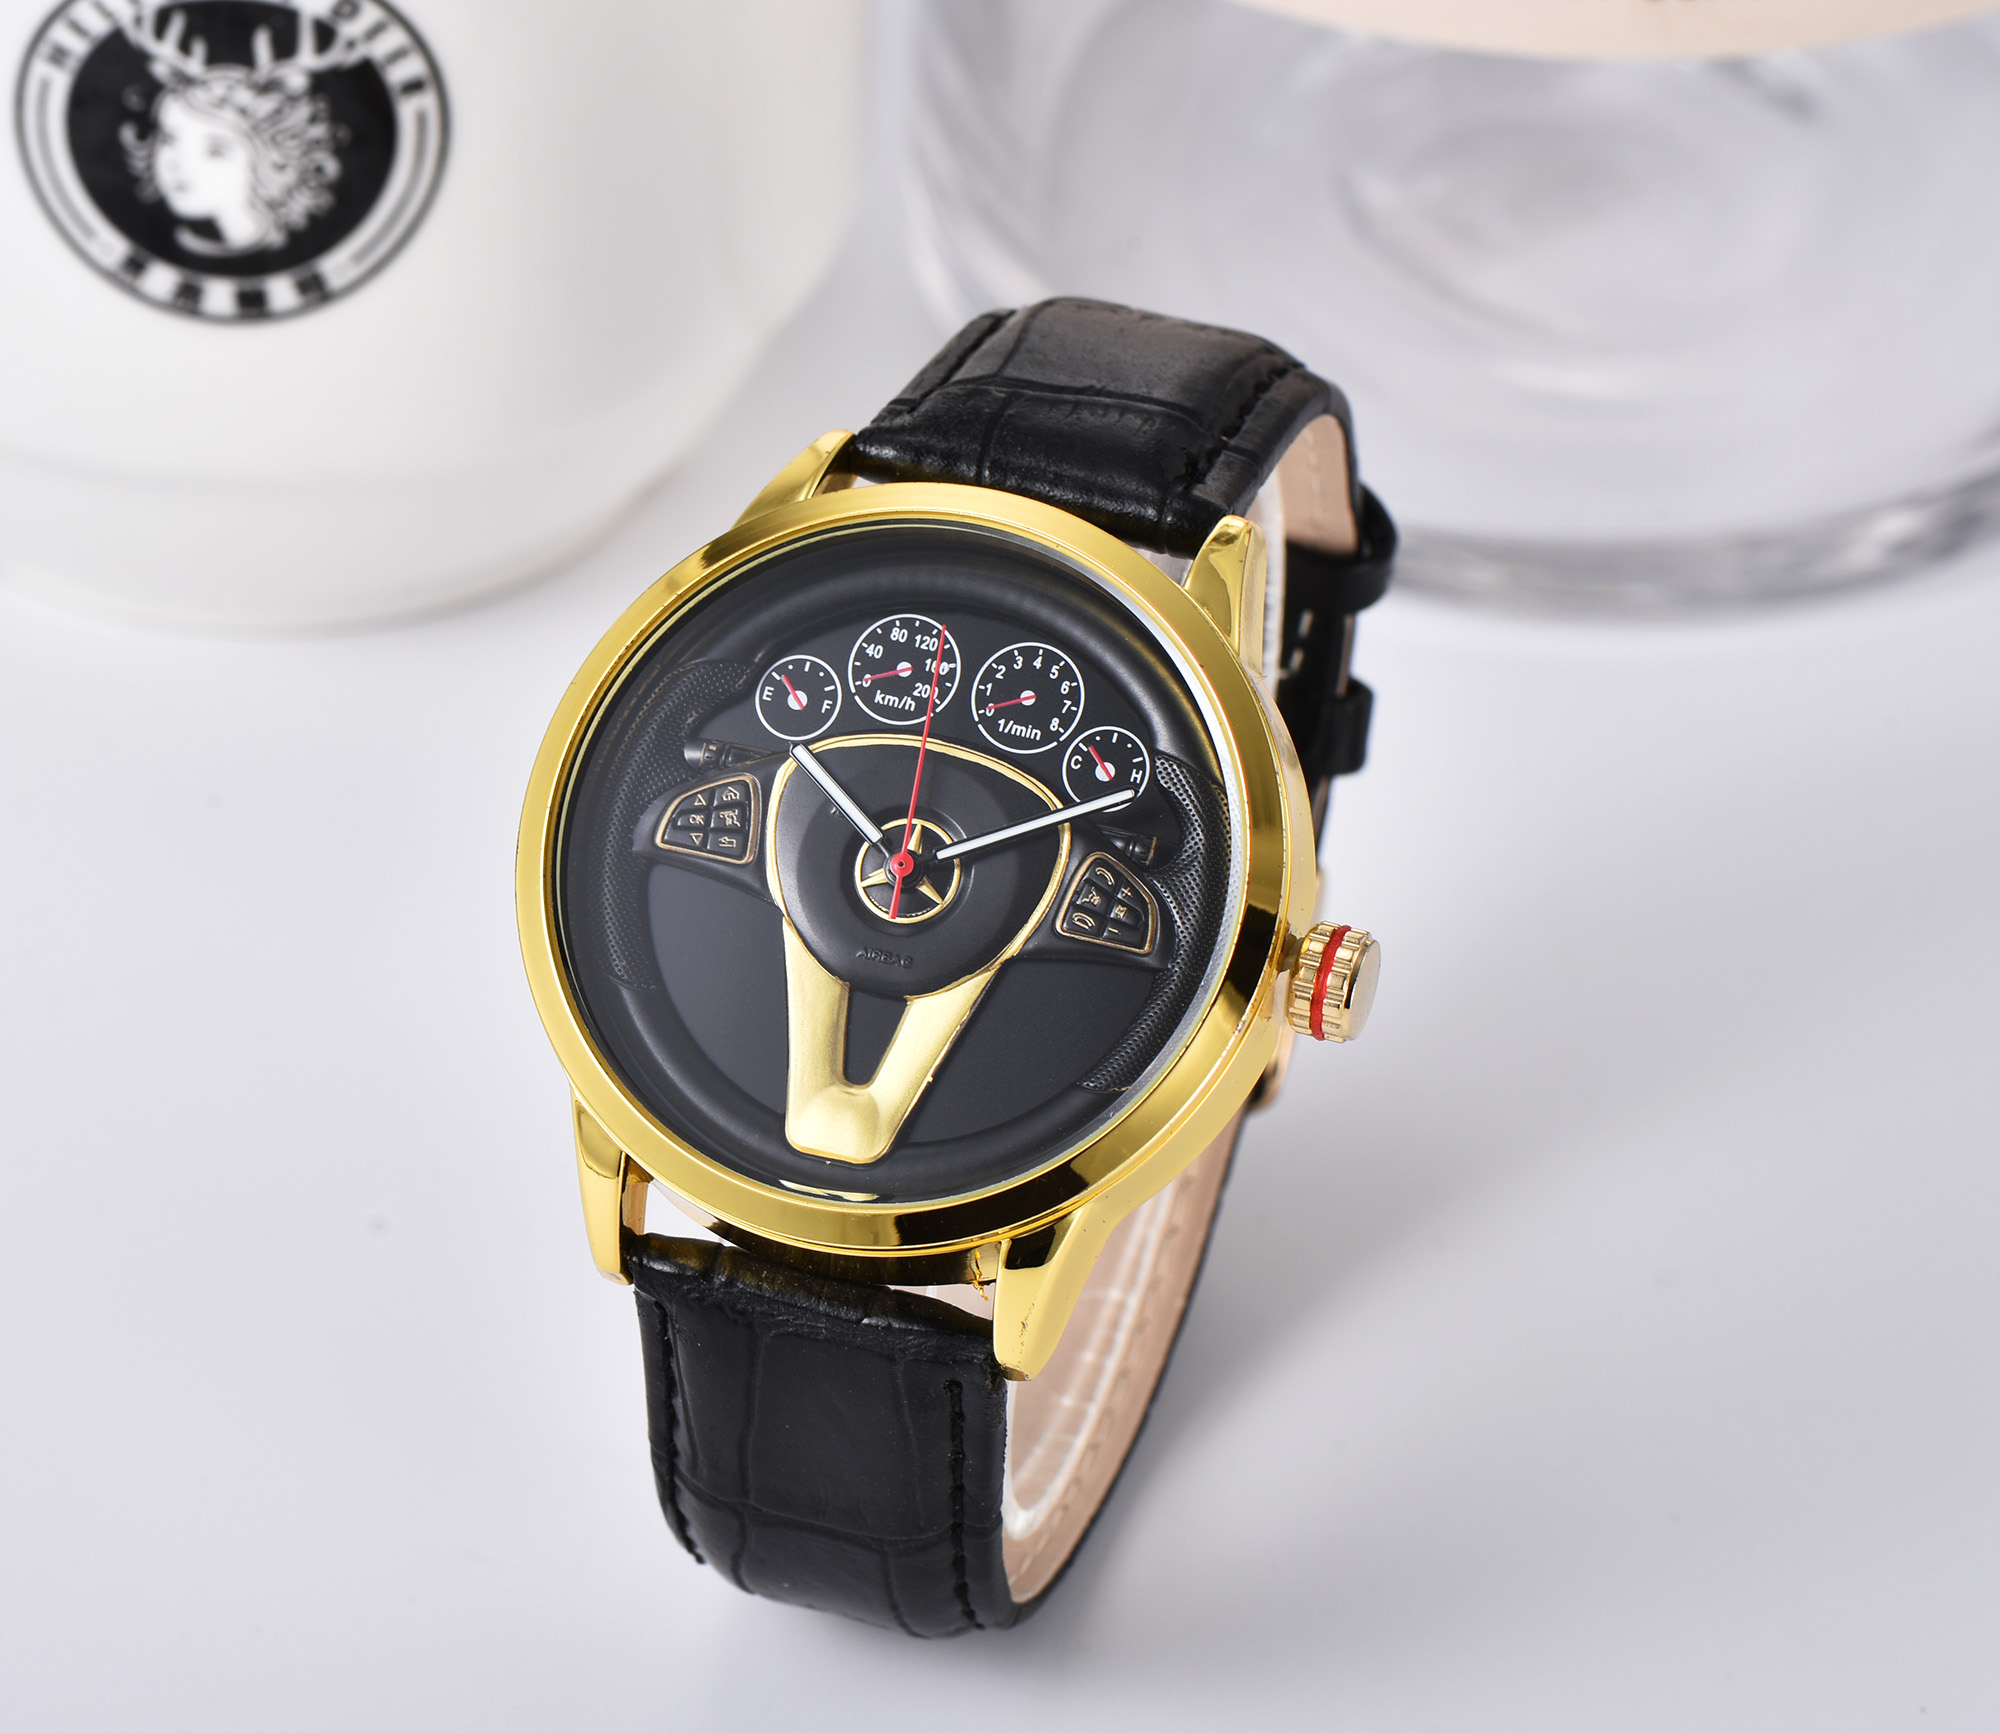 New 2021 top luxury business men's and women's watch Seiko production boss wearing casual steel belt quartz mechanical watch 1